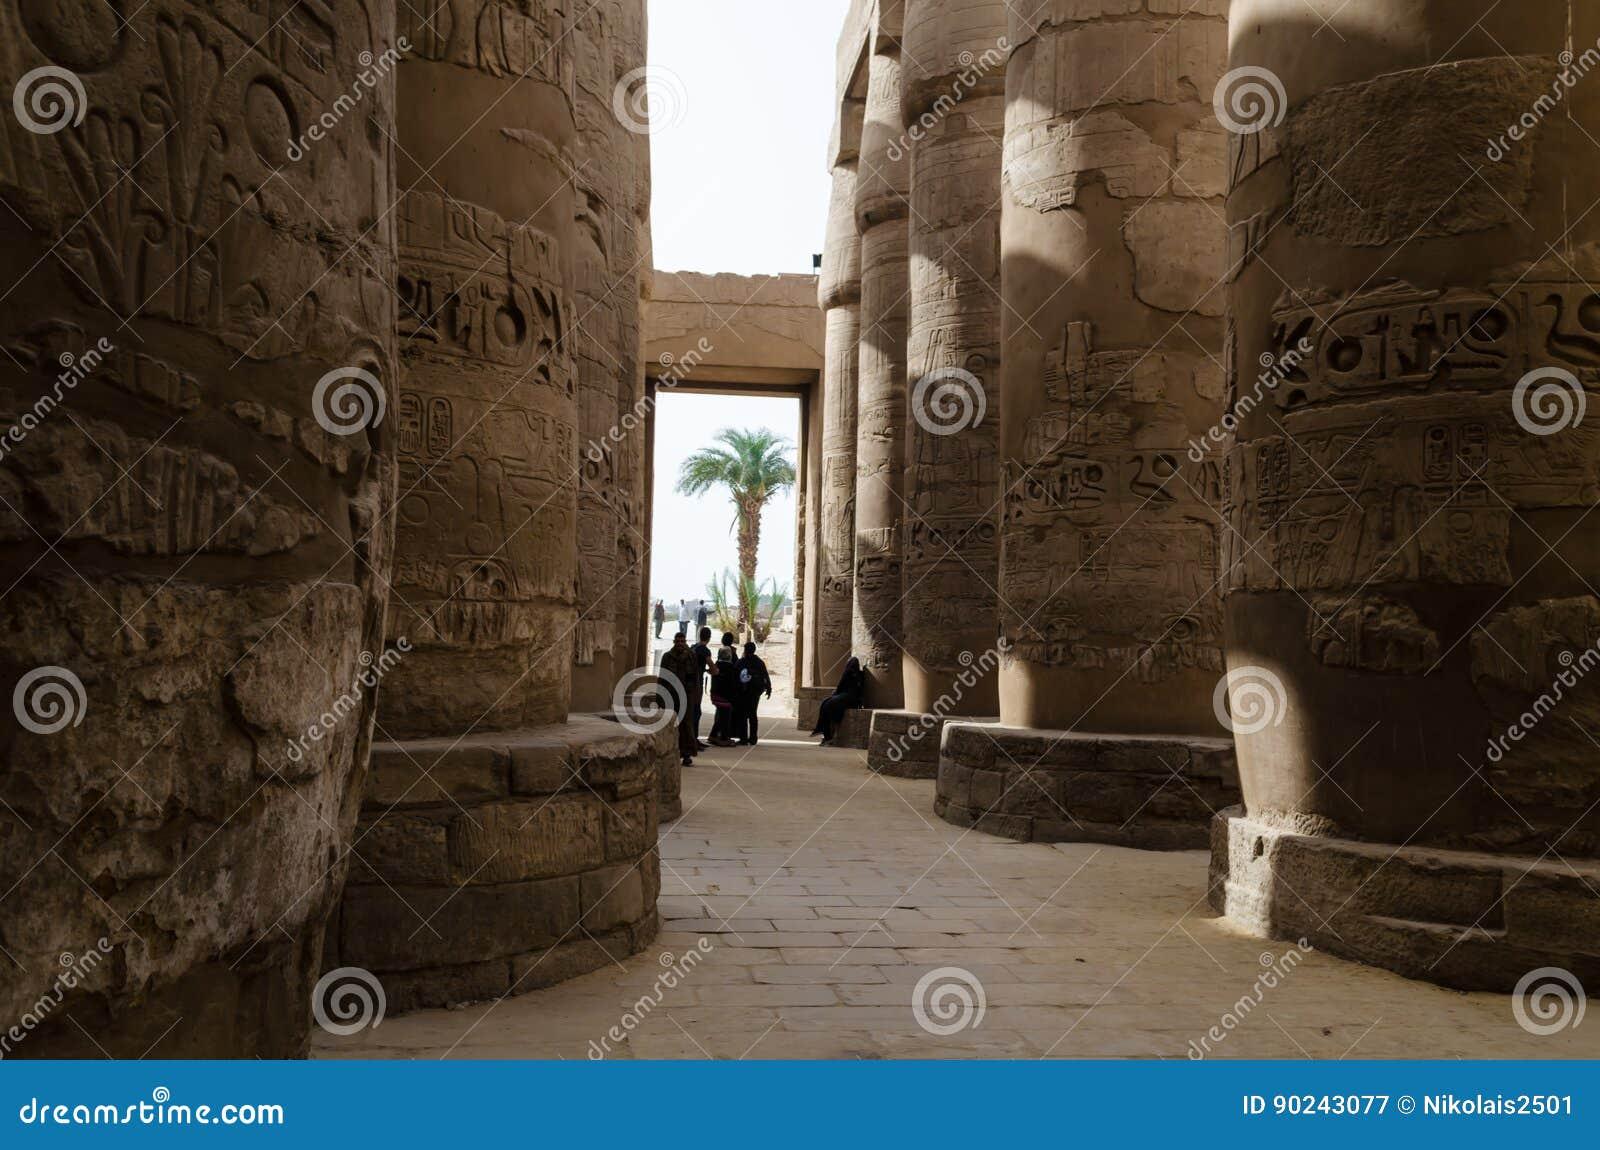 January 2016: Ancient ruins of Karnak temple, Luxor, Egypt